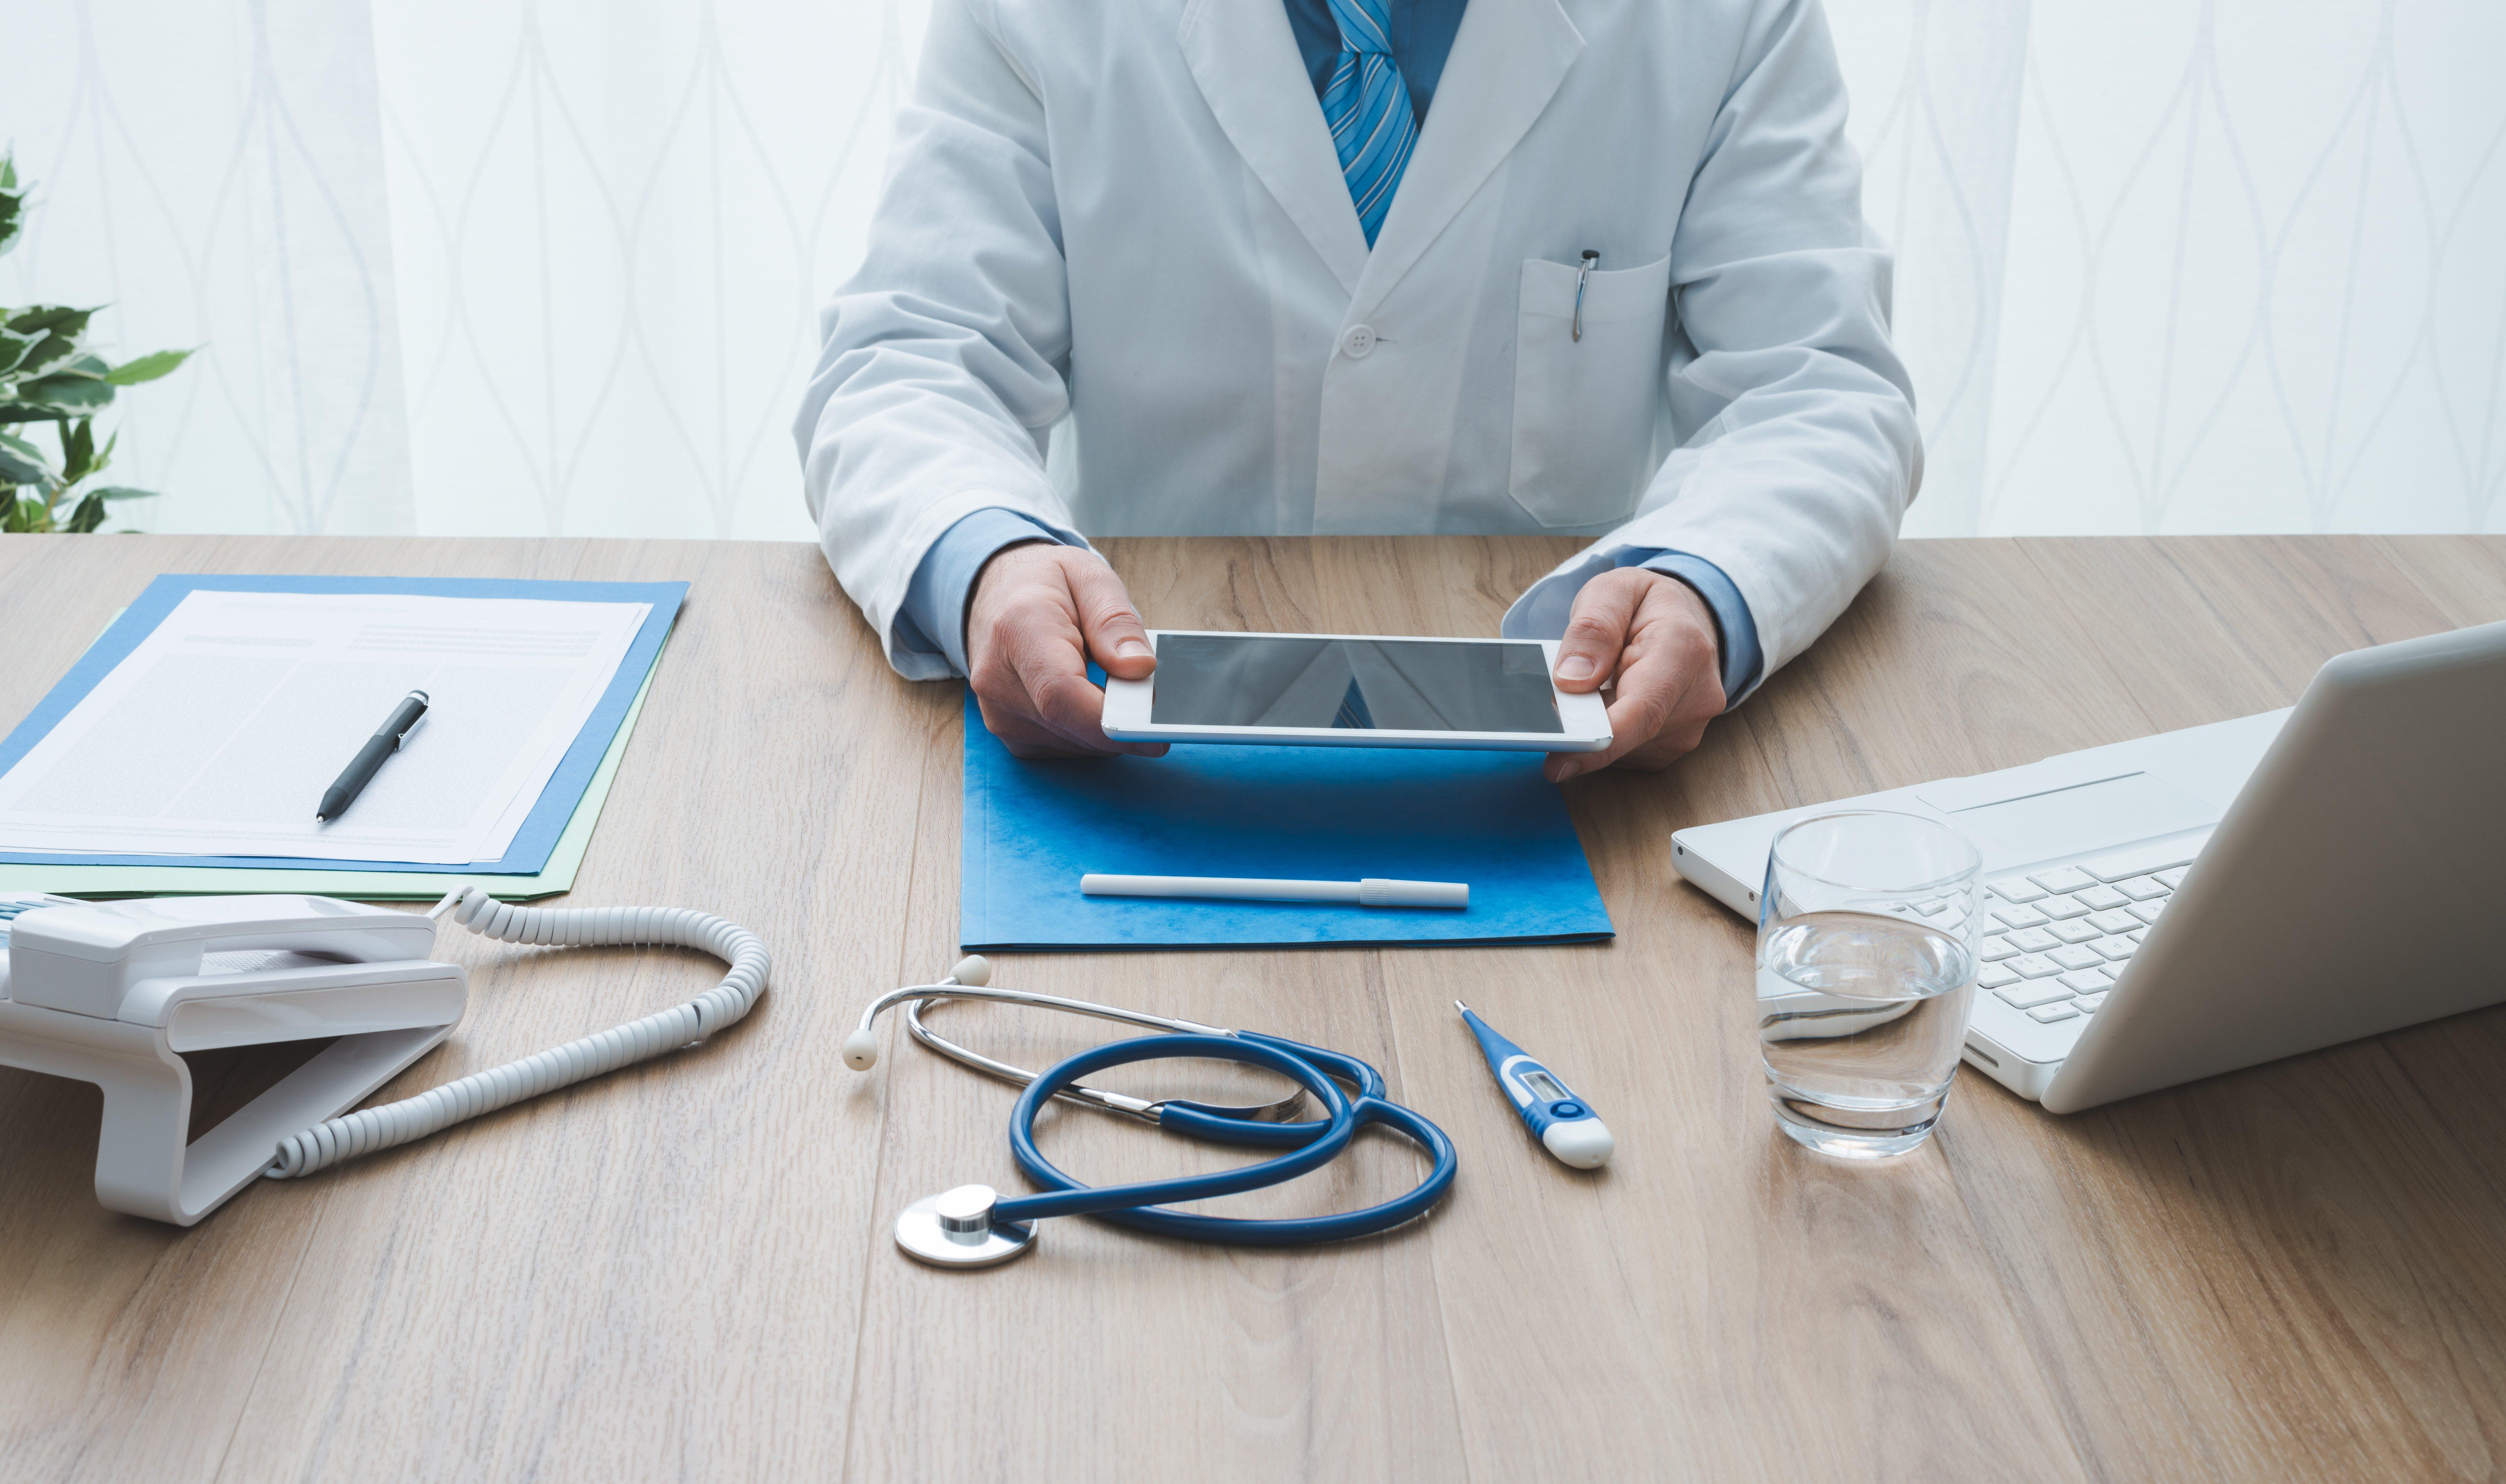 healthcare-and-technology-BQDR58E